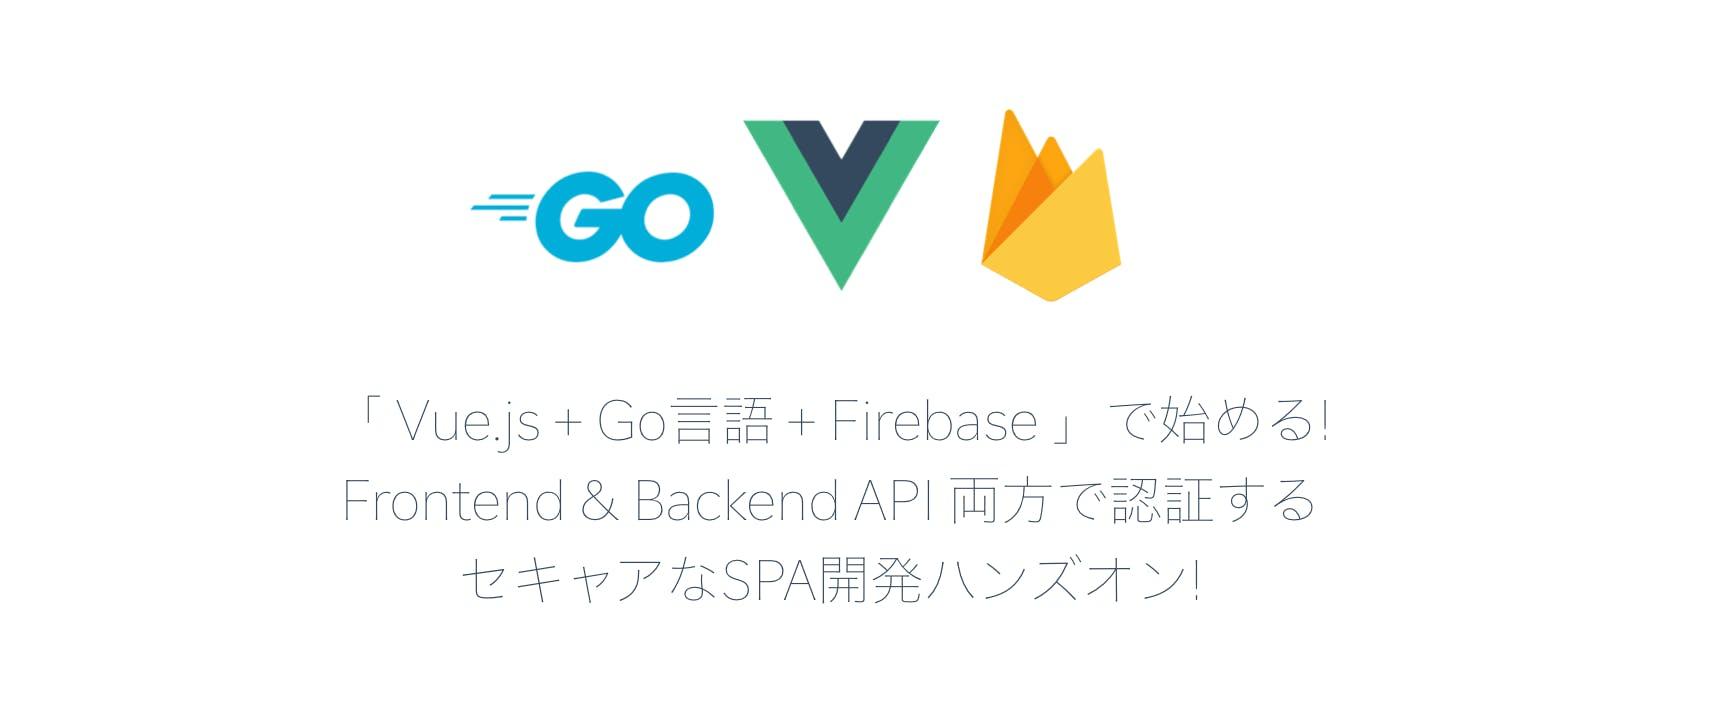 Vue js + Go言語 + Firebase 」で始める! Frontend &